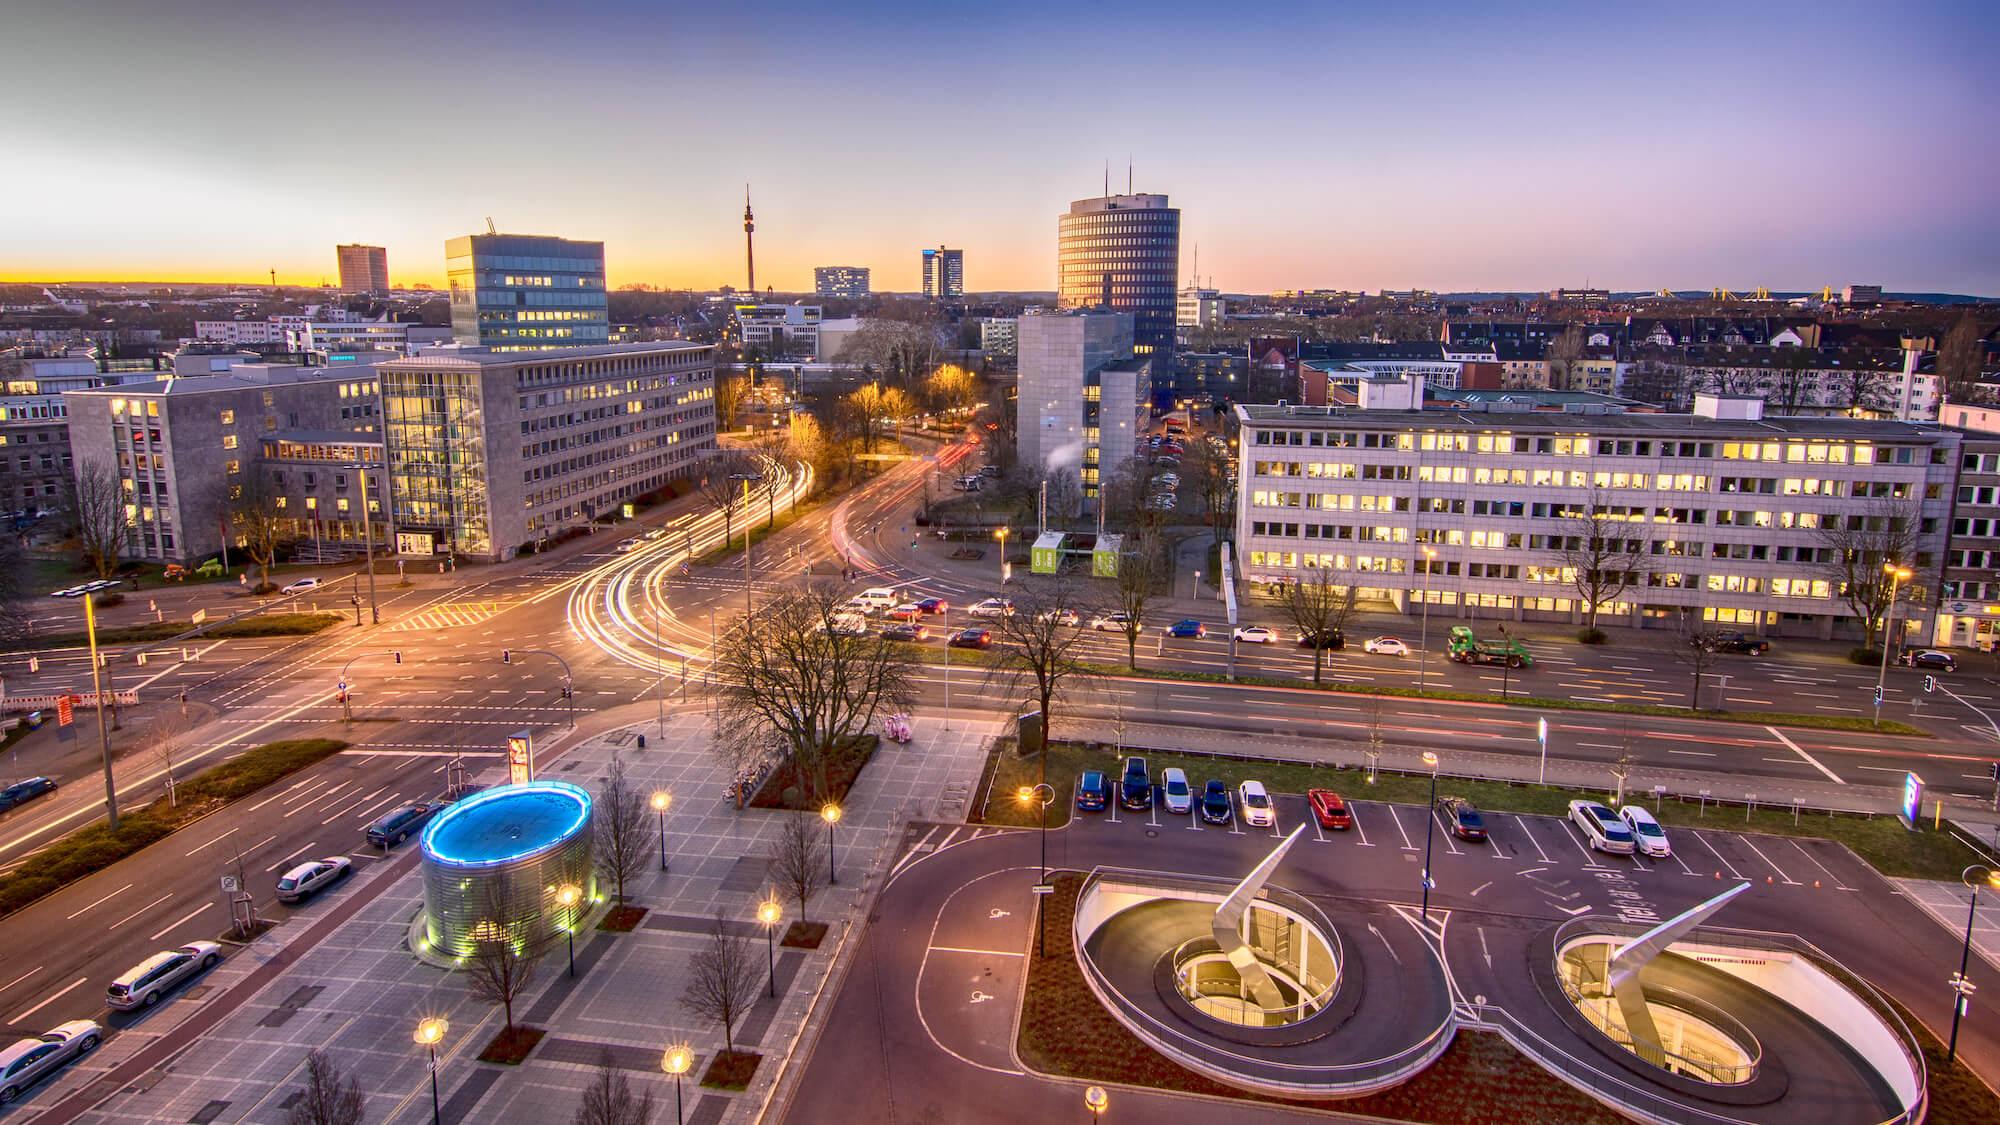 Dortmunder Innenstadt bei Sonnenaufgang